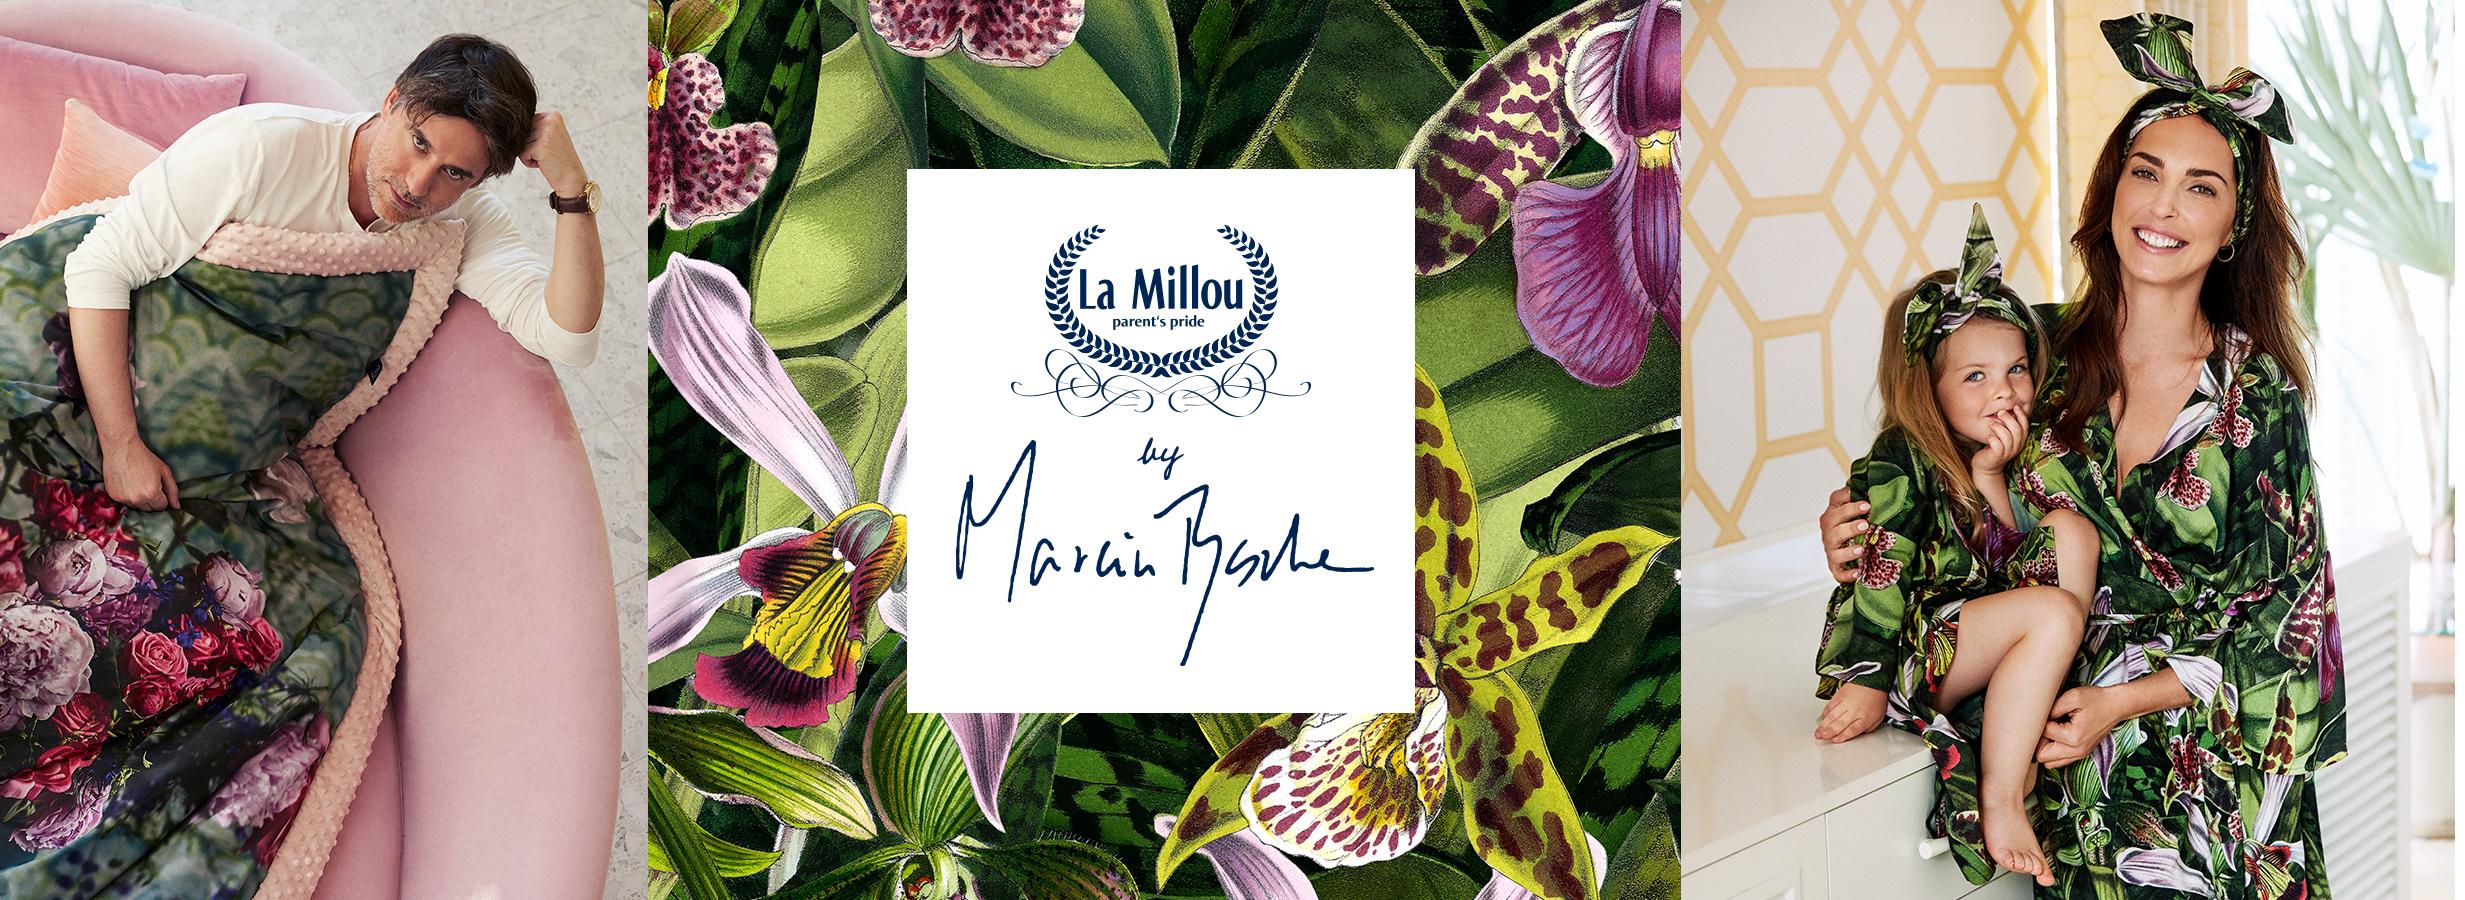 La Millou by Marcin Tyszka